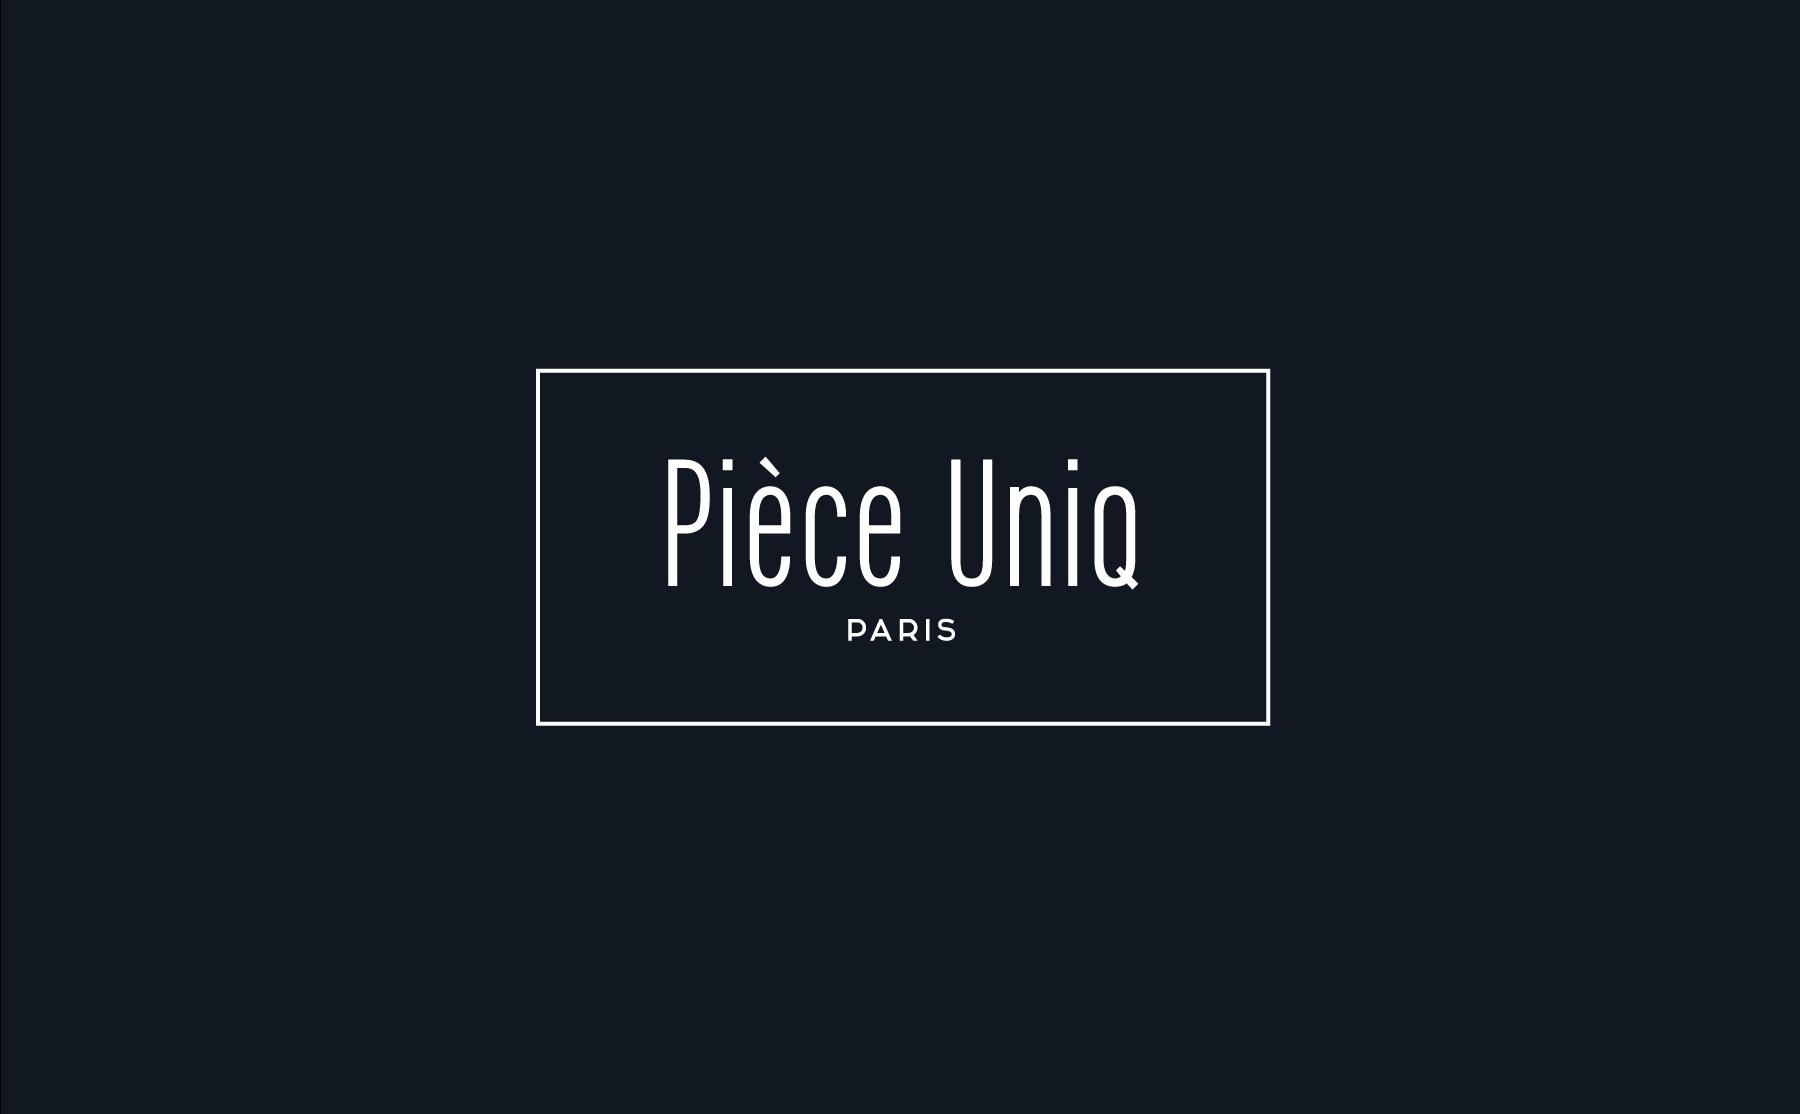 Julien-Foulon-Projet-PieceUniq-01